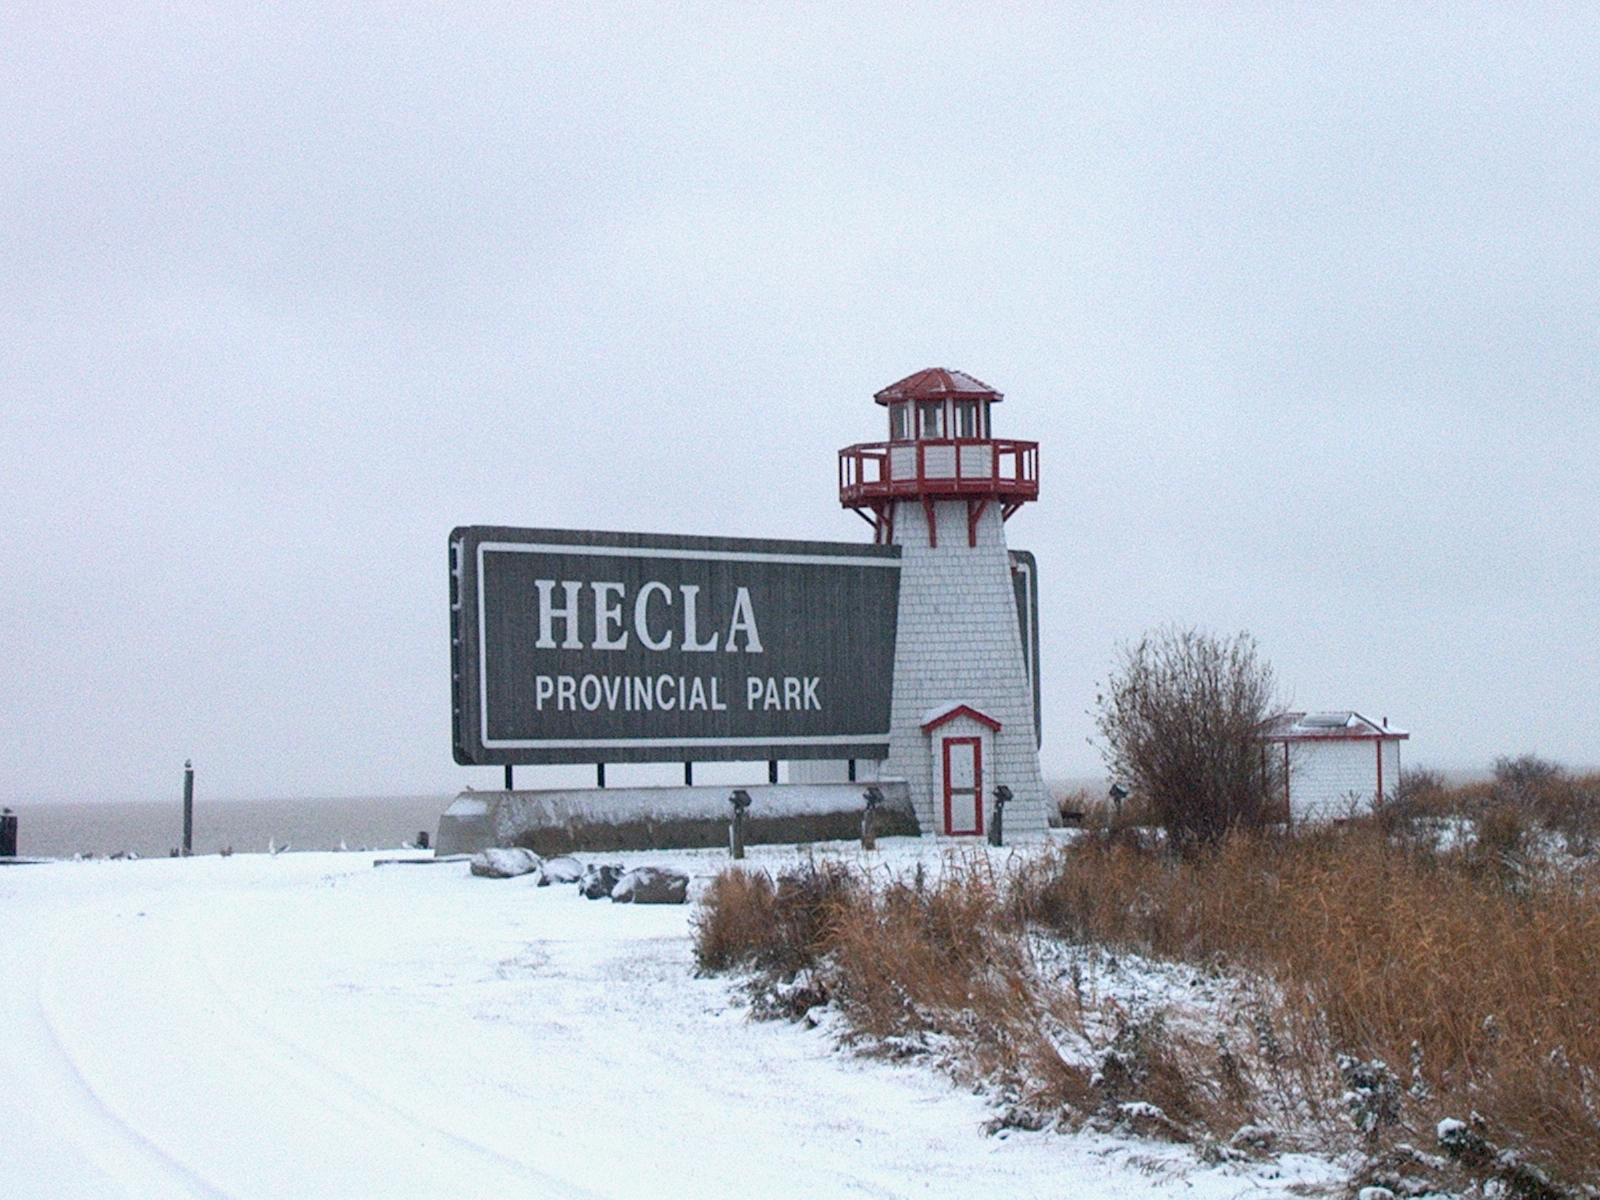 Hecla-Grindstone Provincial Park - Wikipedia